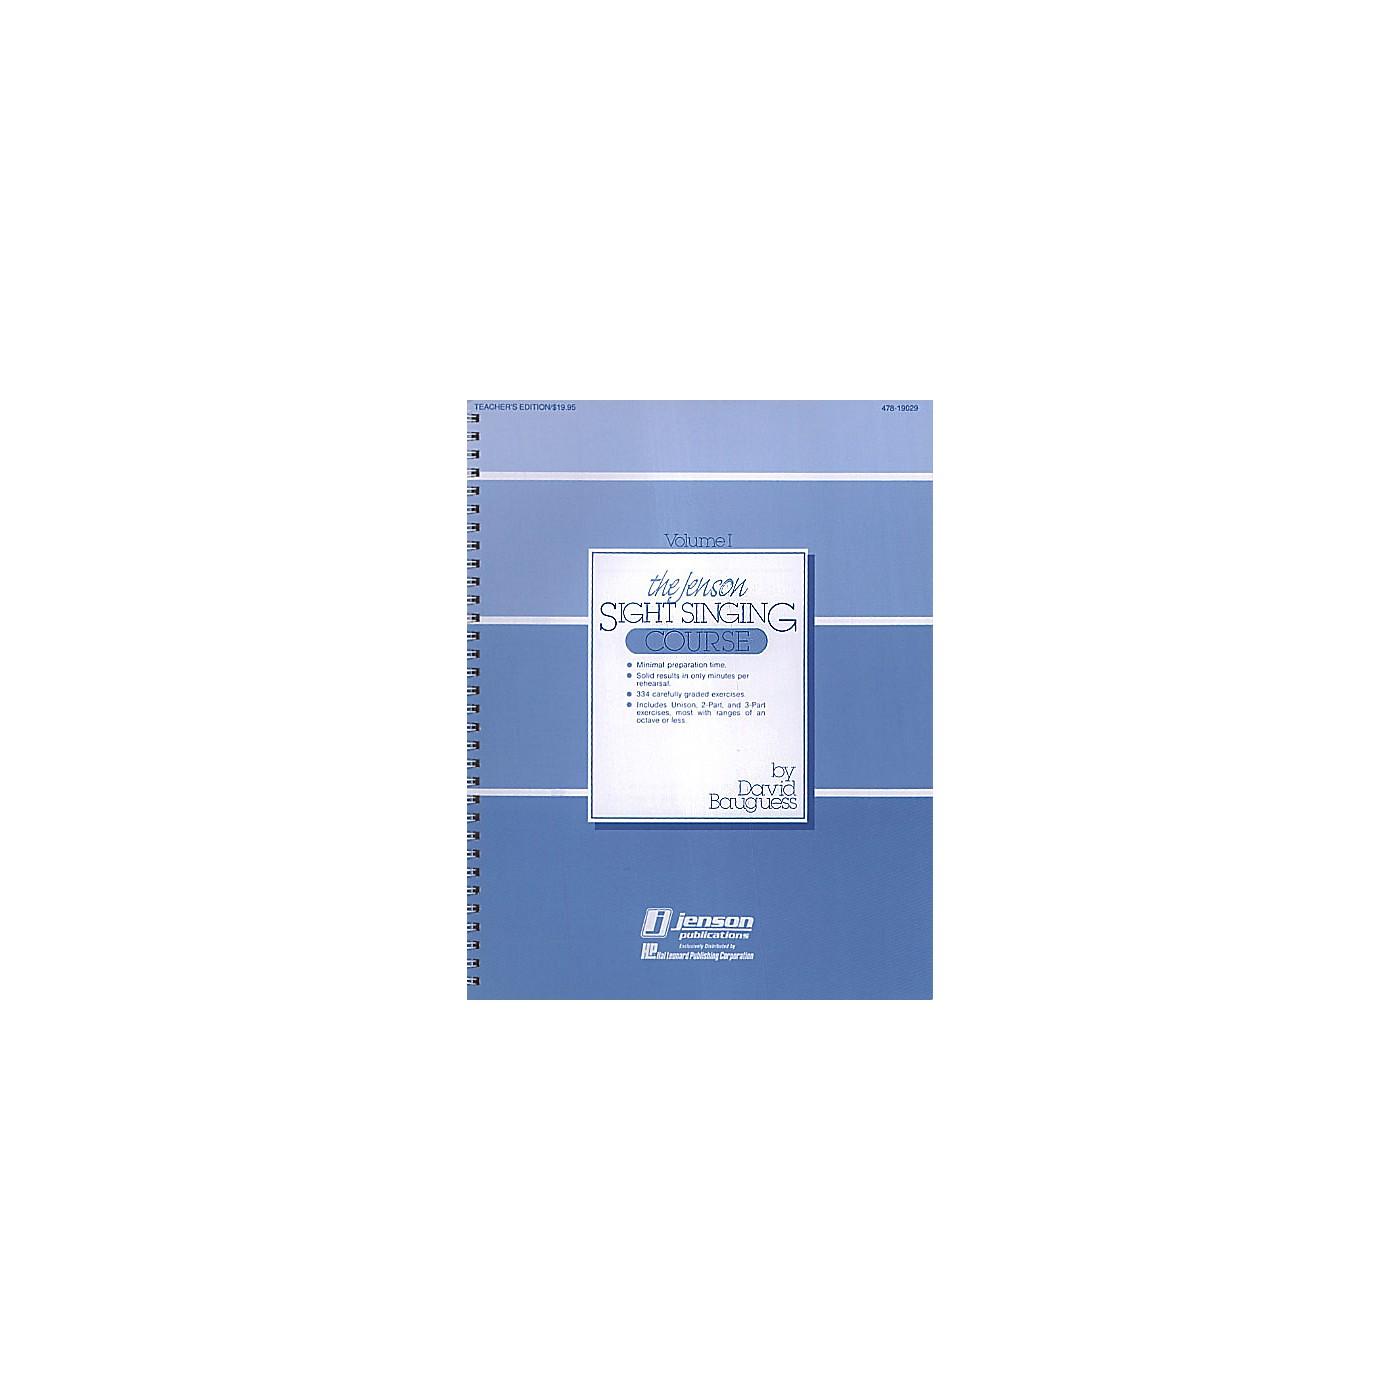 Hal Leonard The Jenson Sight Singing Course (Vol. I) TEACHER ED composed by David Bauguess thumbnail